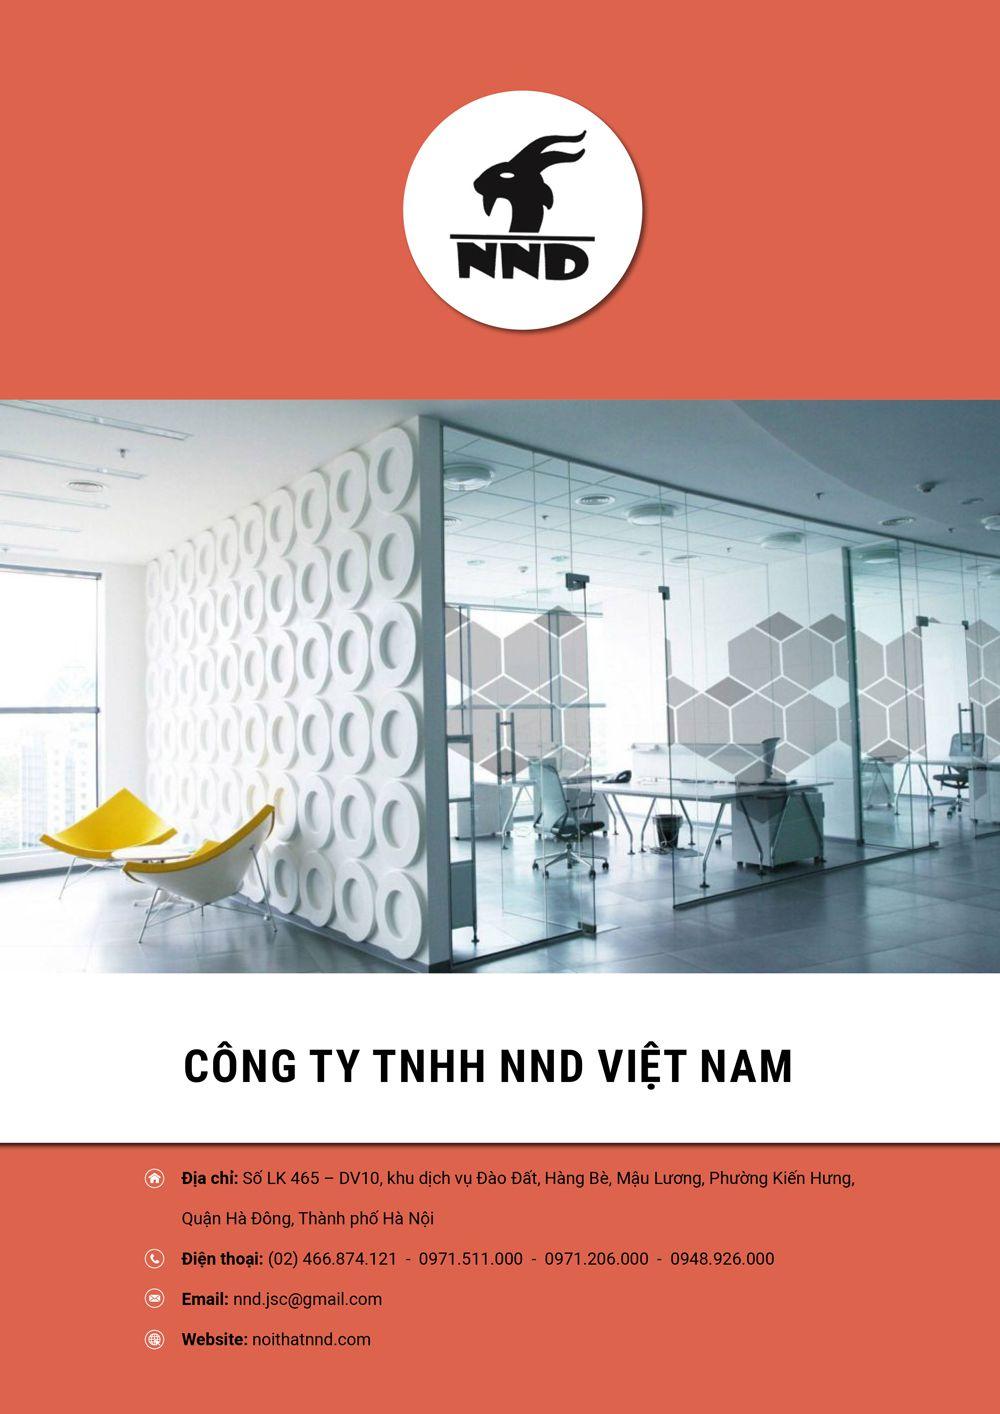 FILE-XEM-_HSNL_-CTY-NND-VIET-NAM-12